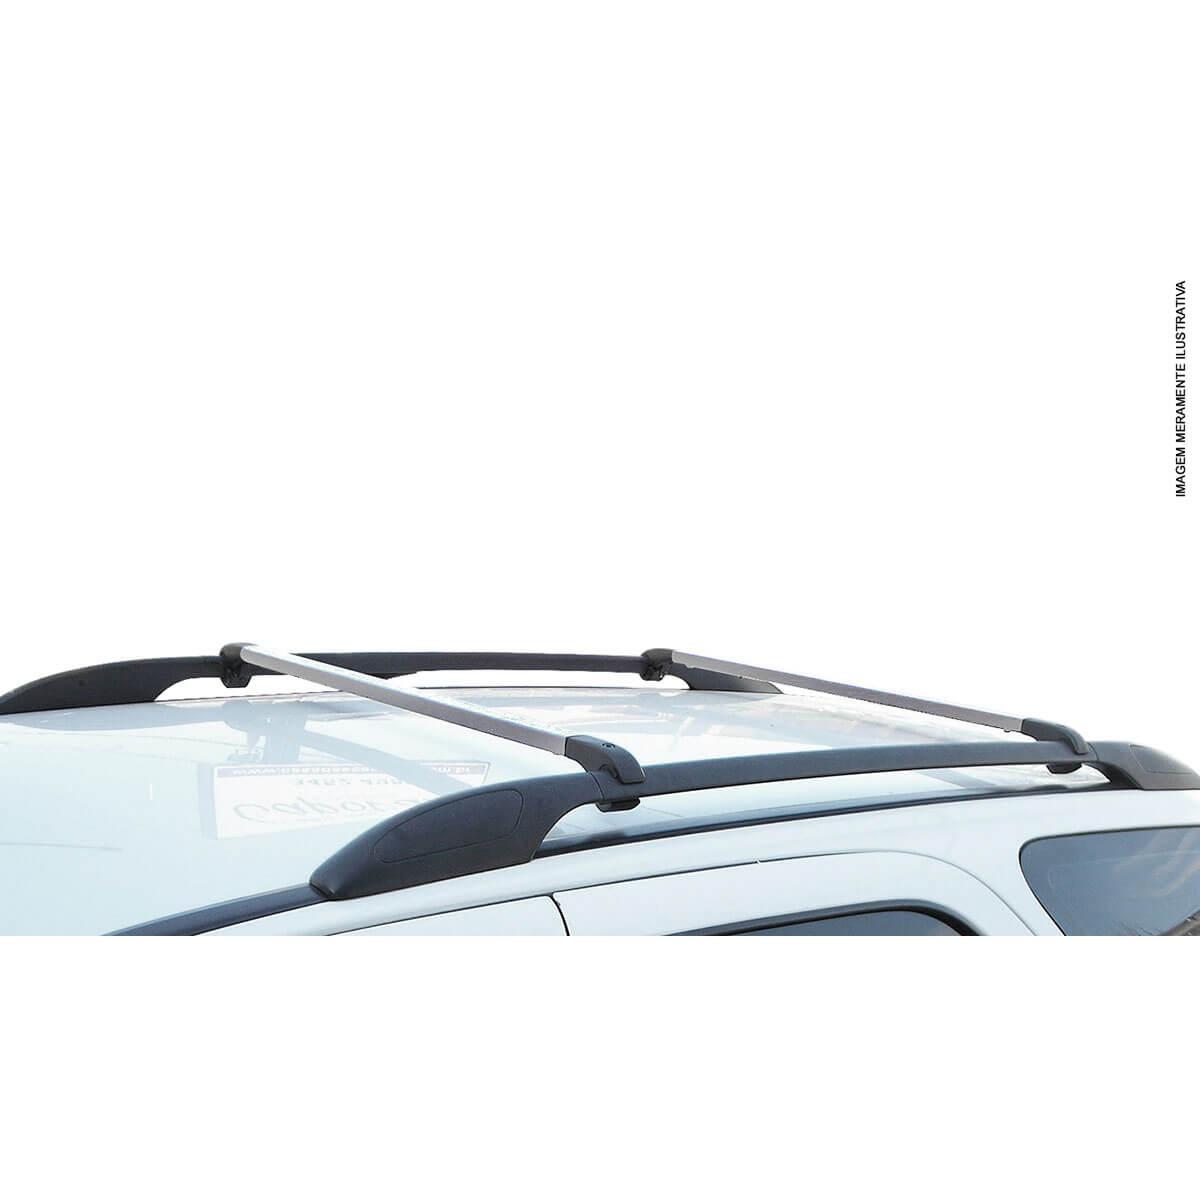 Travessa rack de teto alumínio Aircross 2011 a 2018